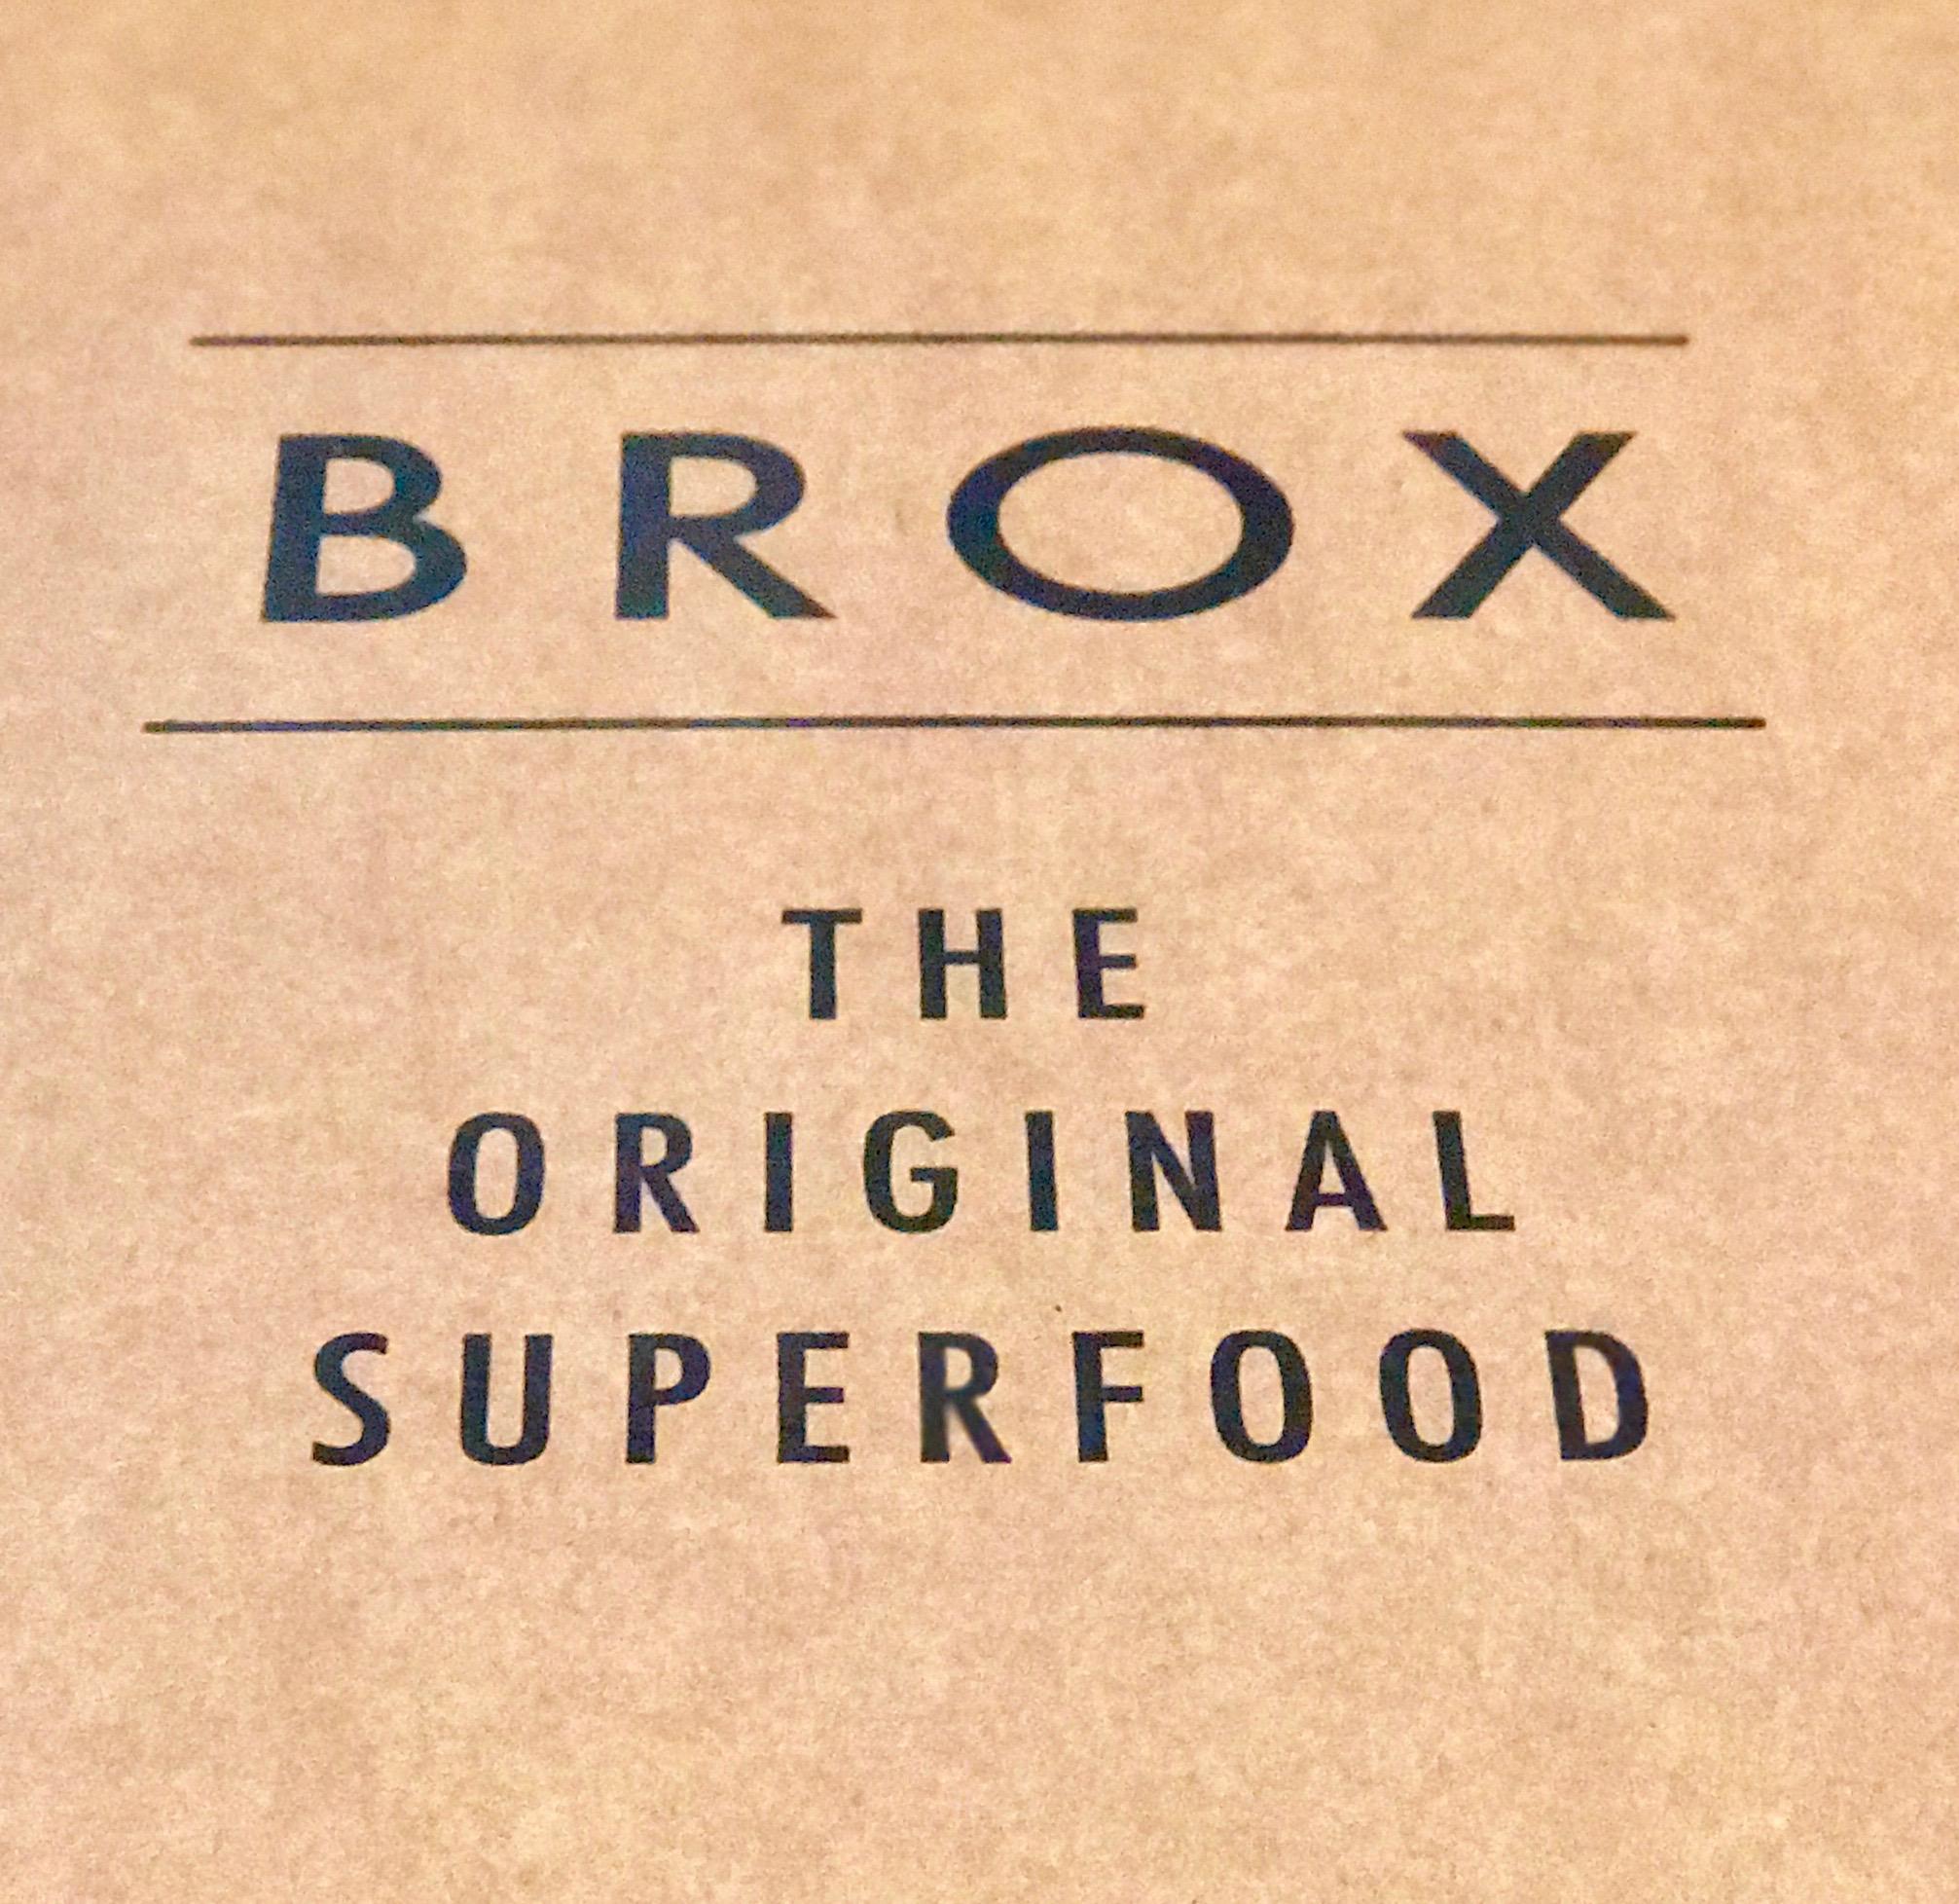 Brox-Knochenbrühe Karton